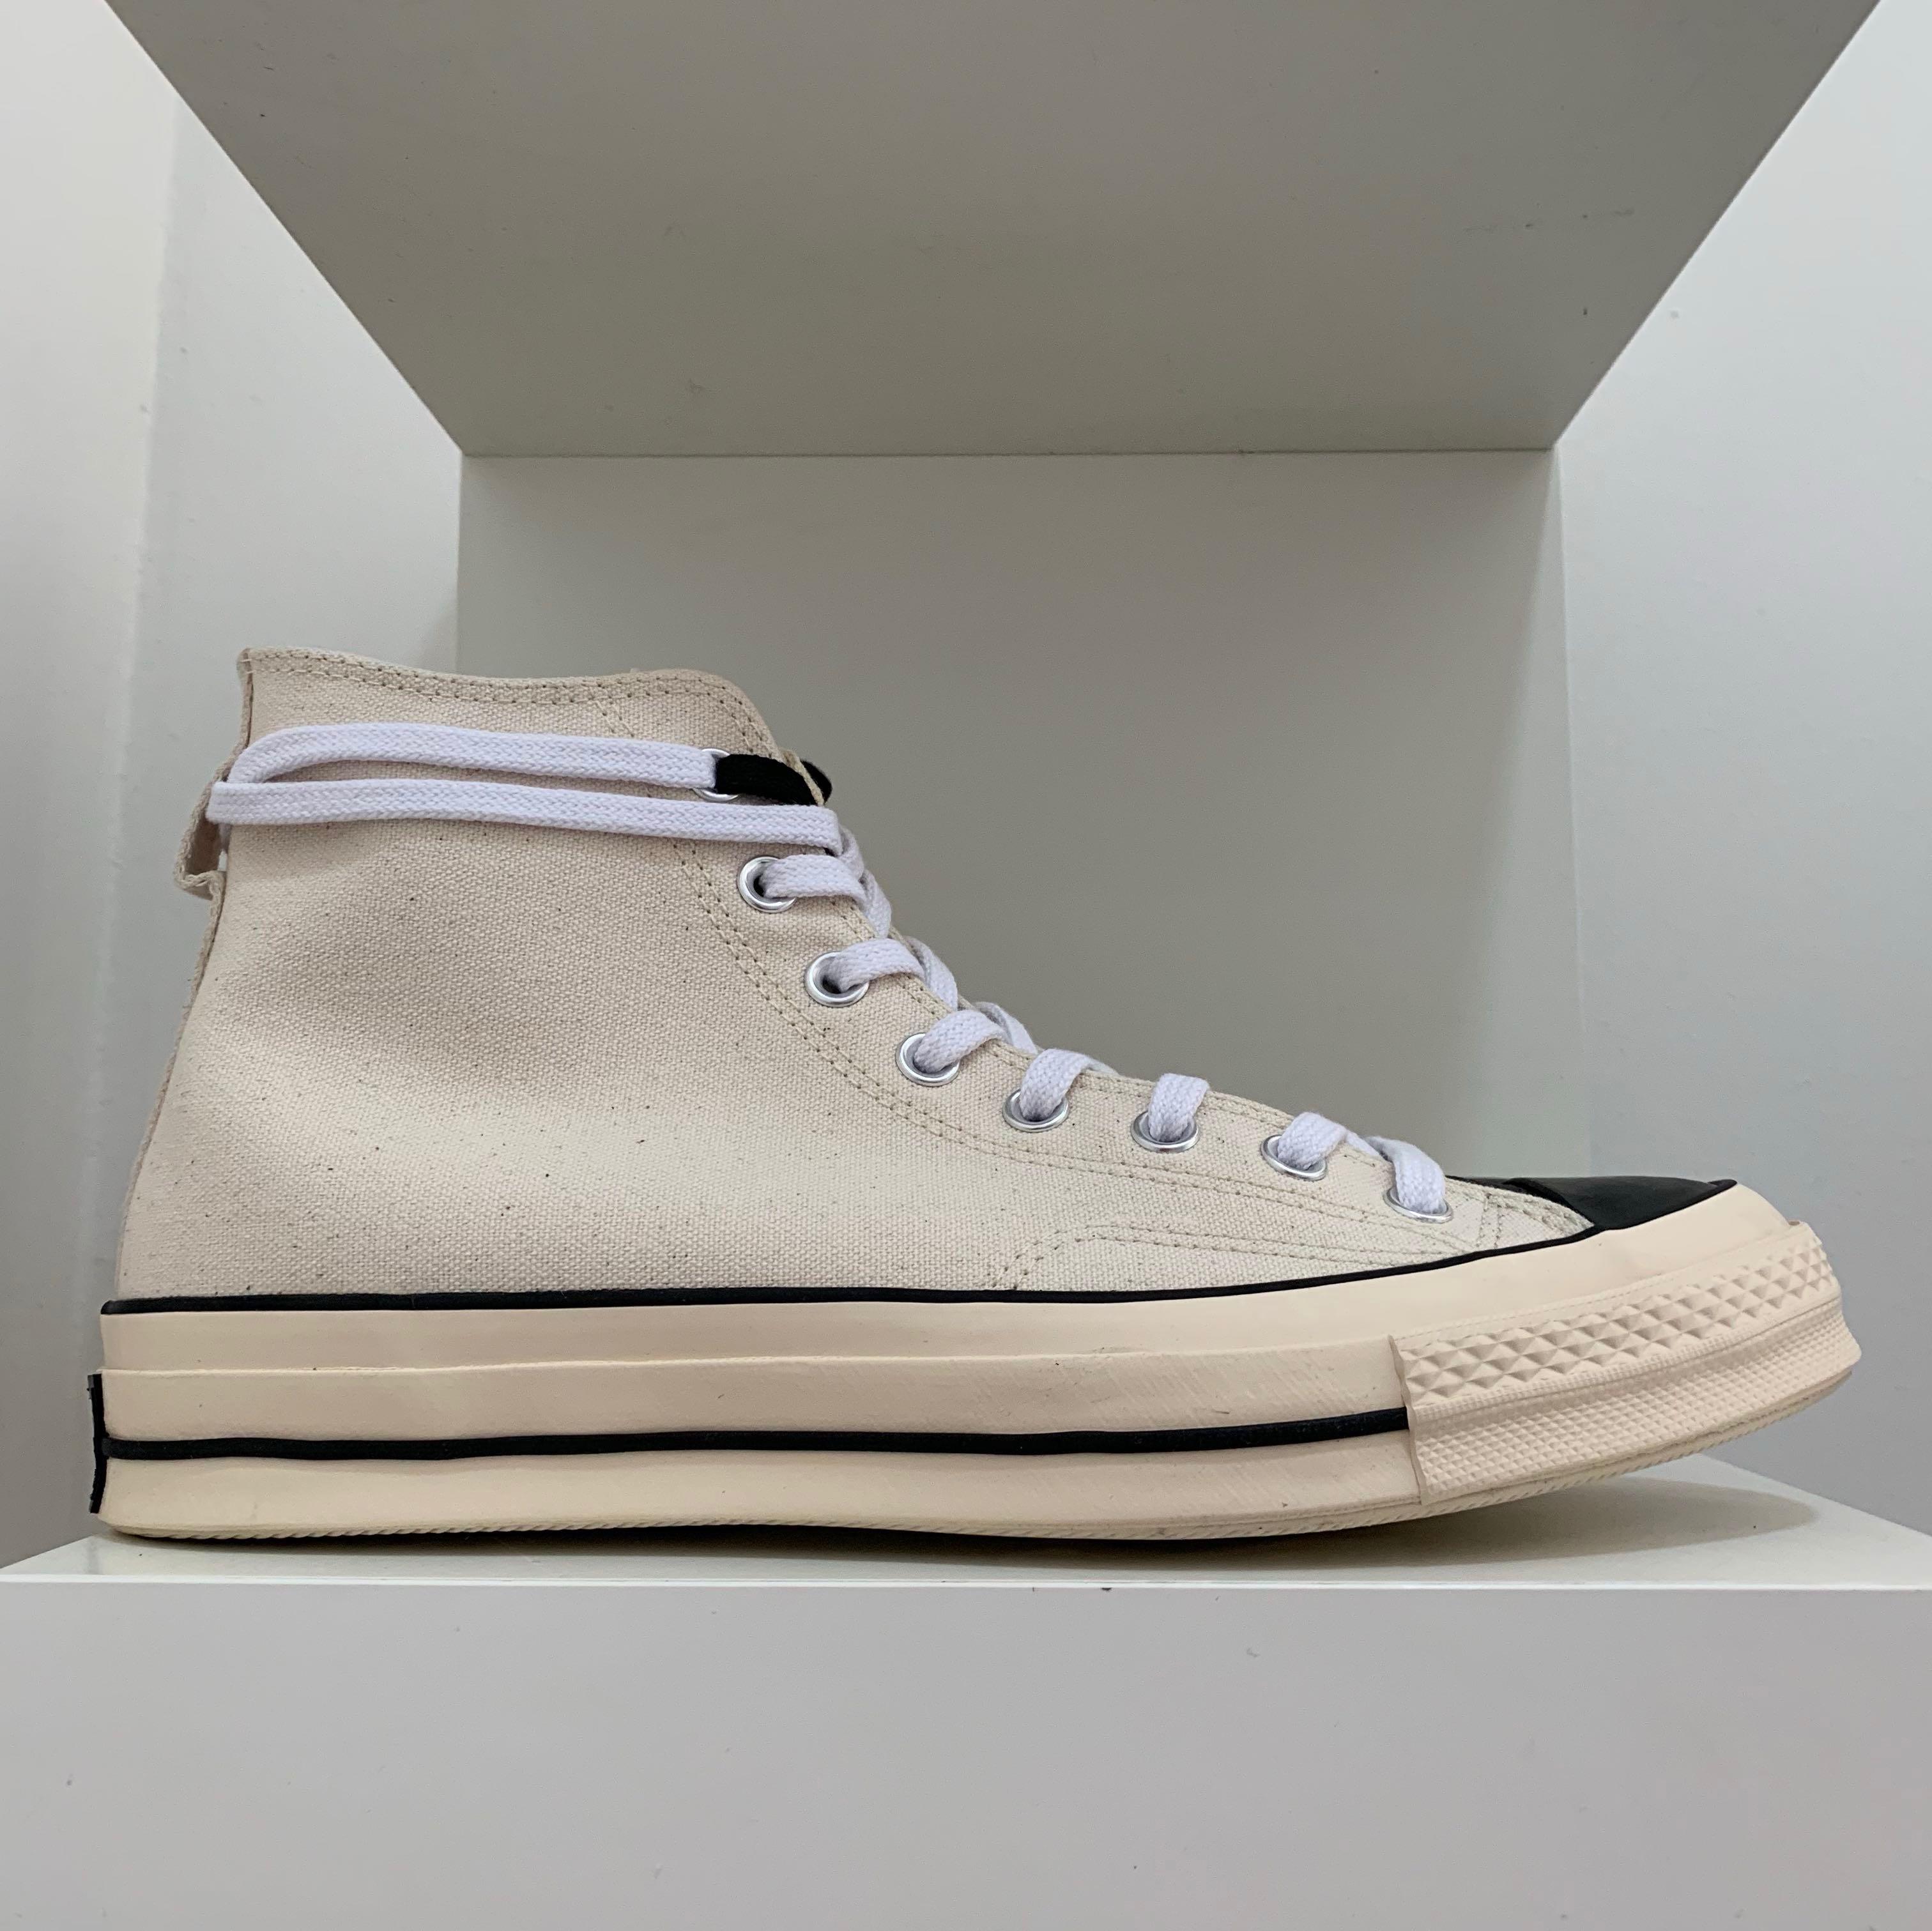 Fear Of God Cream Converse Chuck Taylor All Star 70 High 95645c128